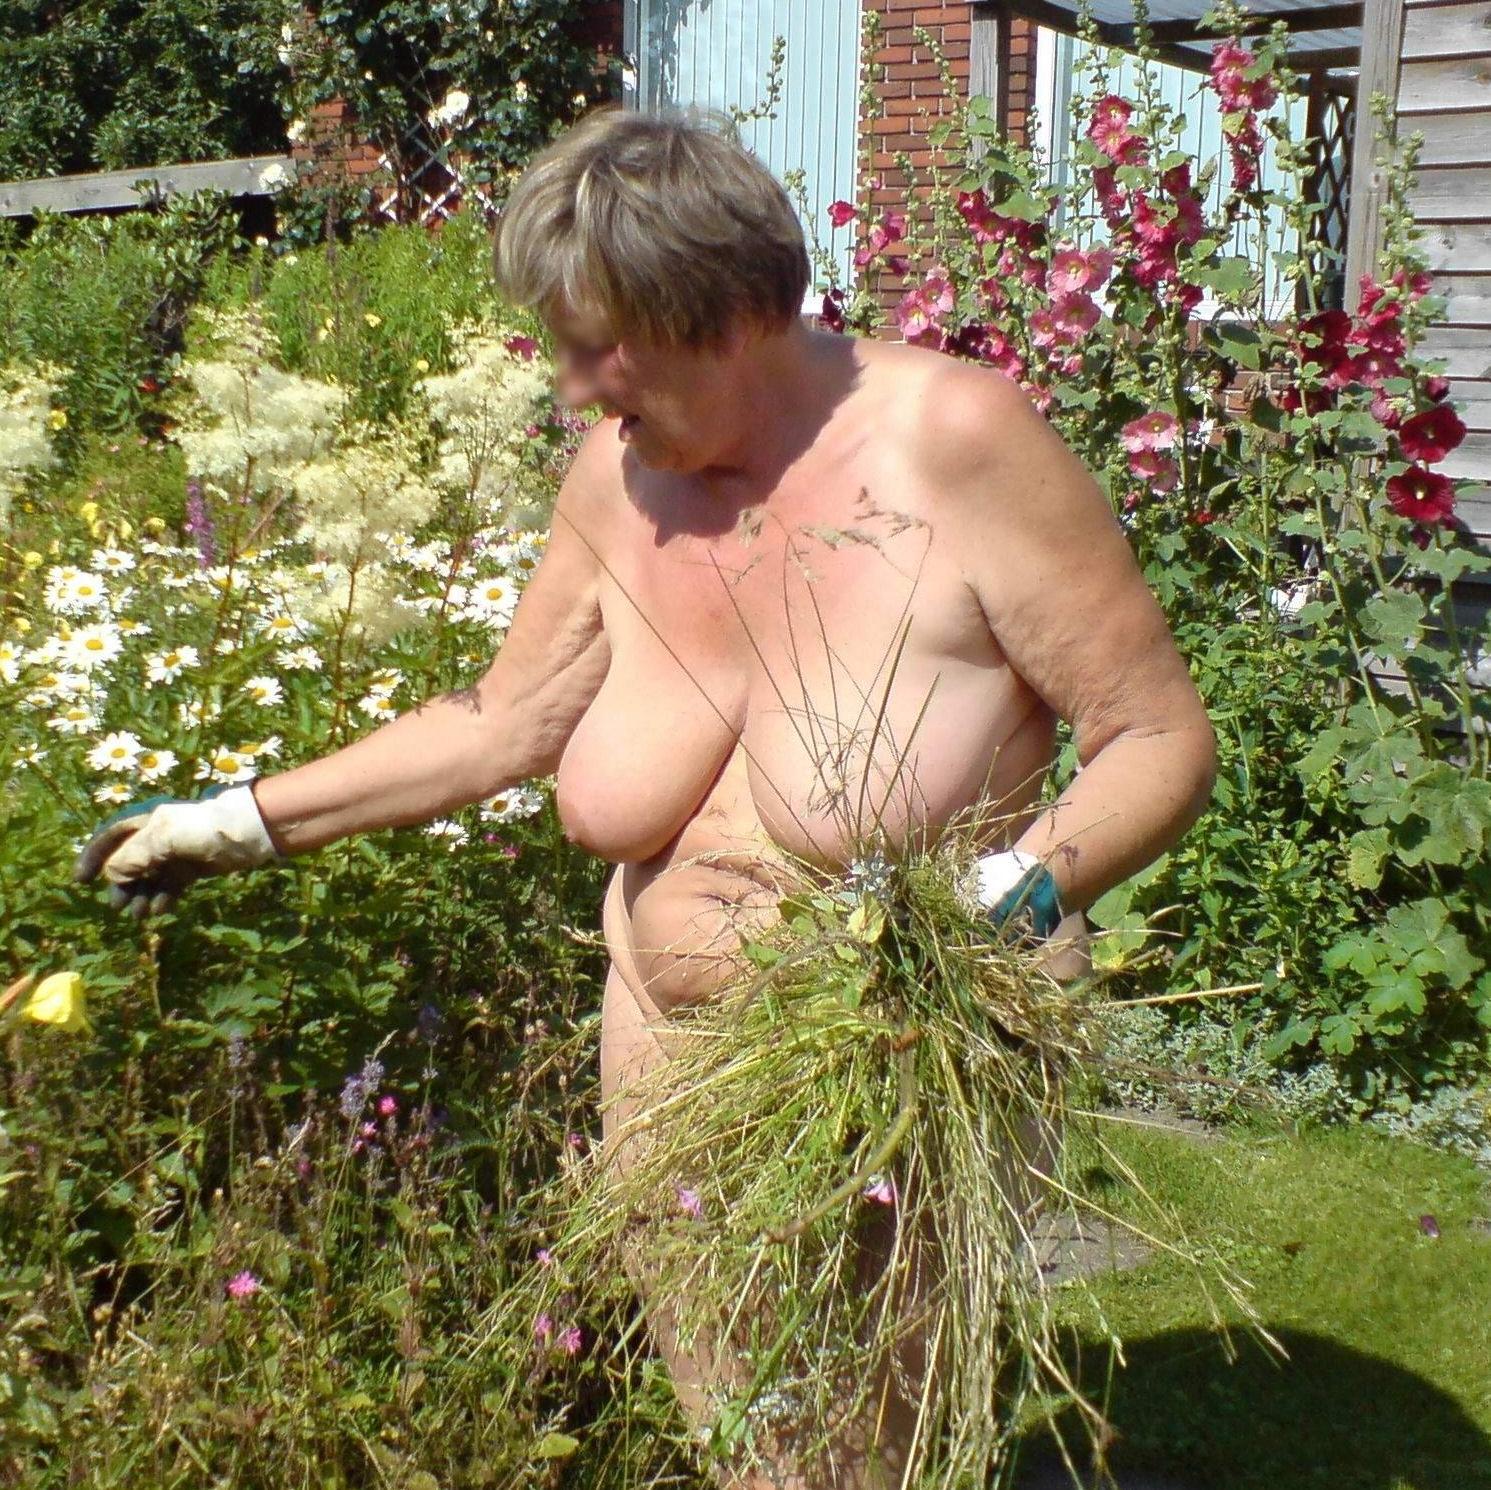 World nude day video congratulate, what